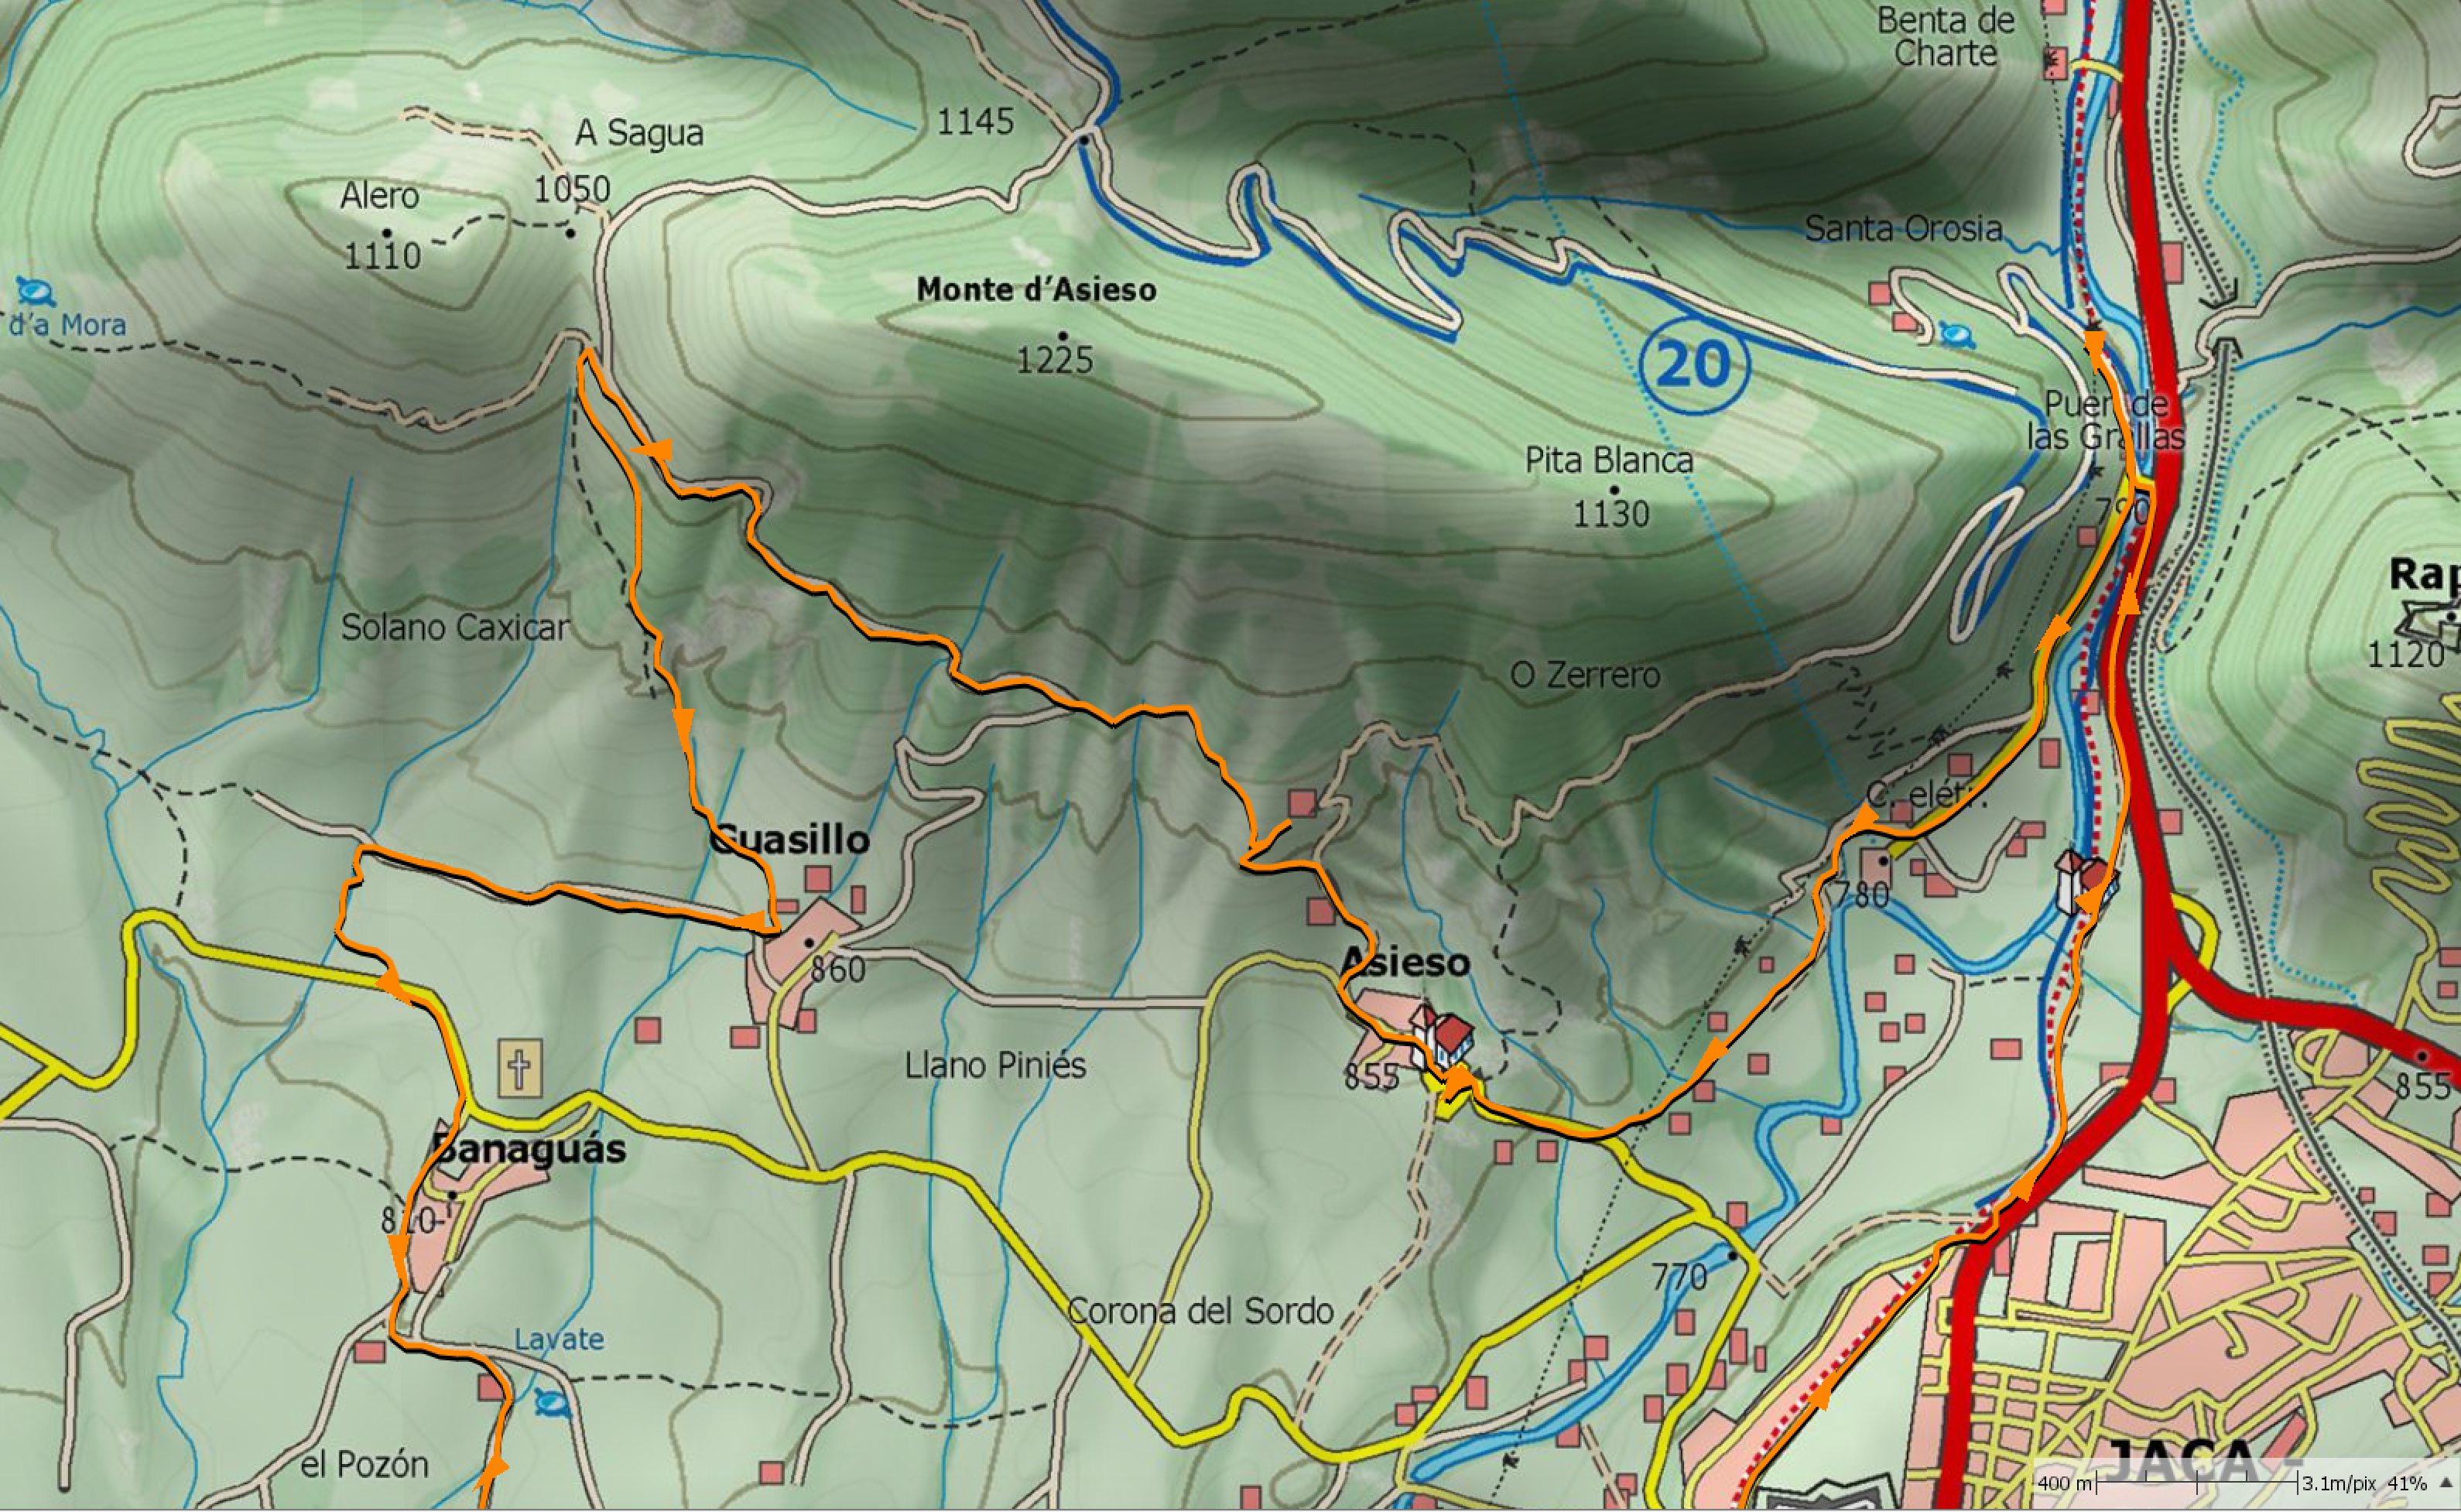 Mapa SUA, sendas Asieso y Guasillo